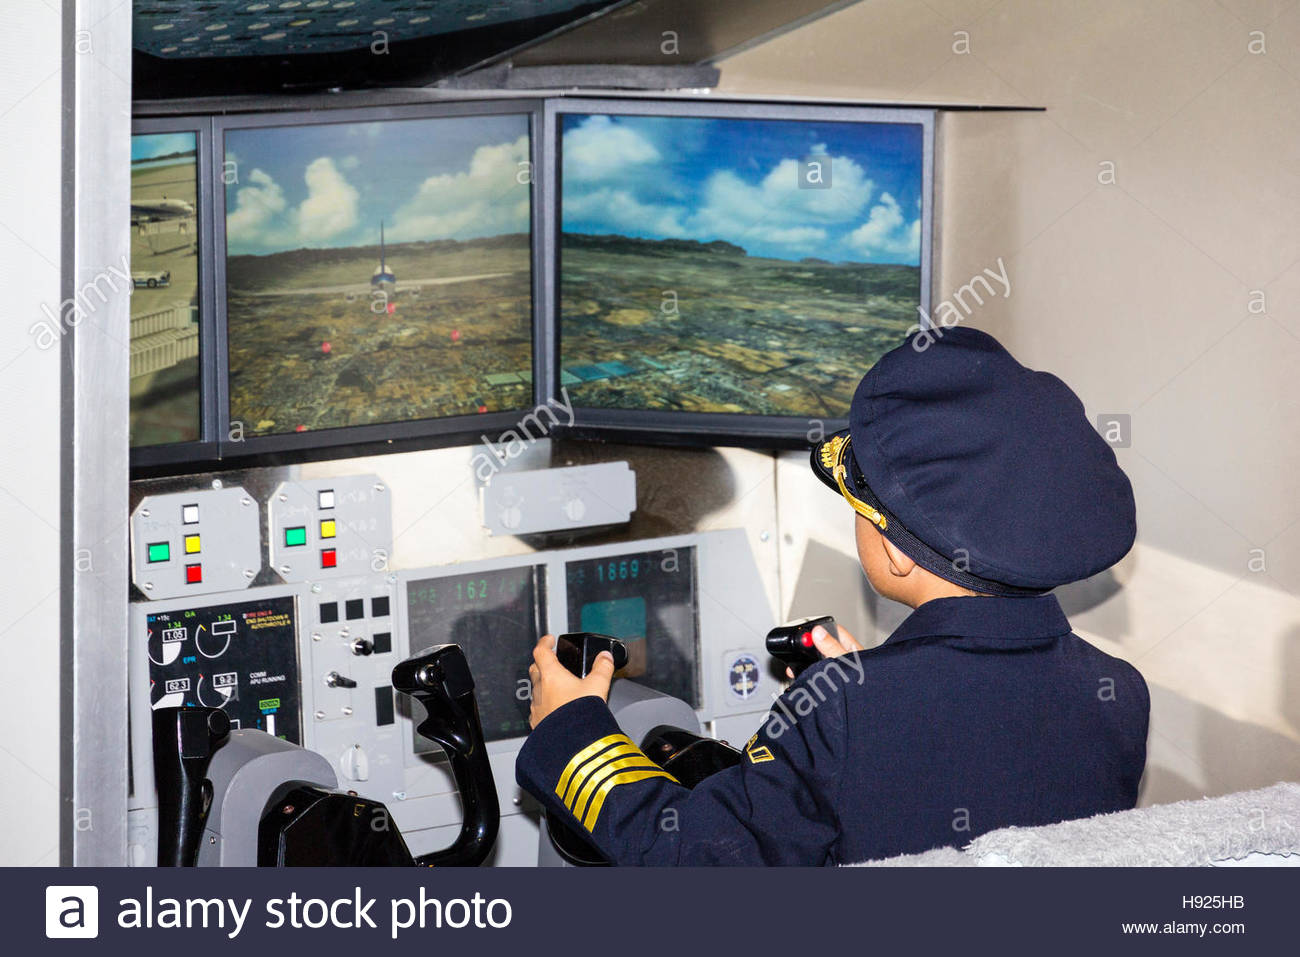 Click image for larger version.  Name:japan-nishinomiya-kidzania-ana-flight-simulators-with-boy-child-in-H925HB.jpg Views:44 Size:151.8 KB ID:25492